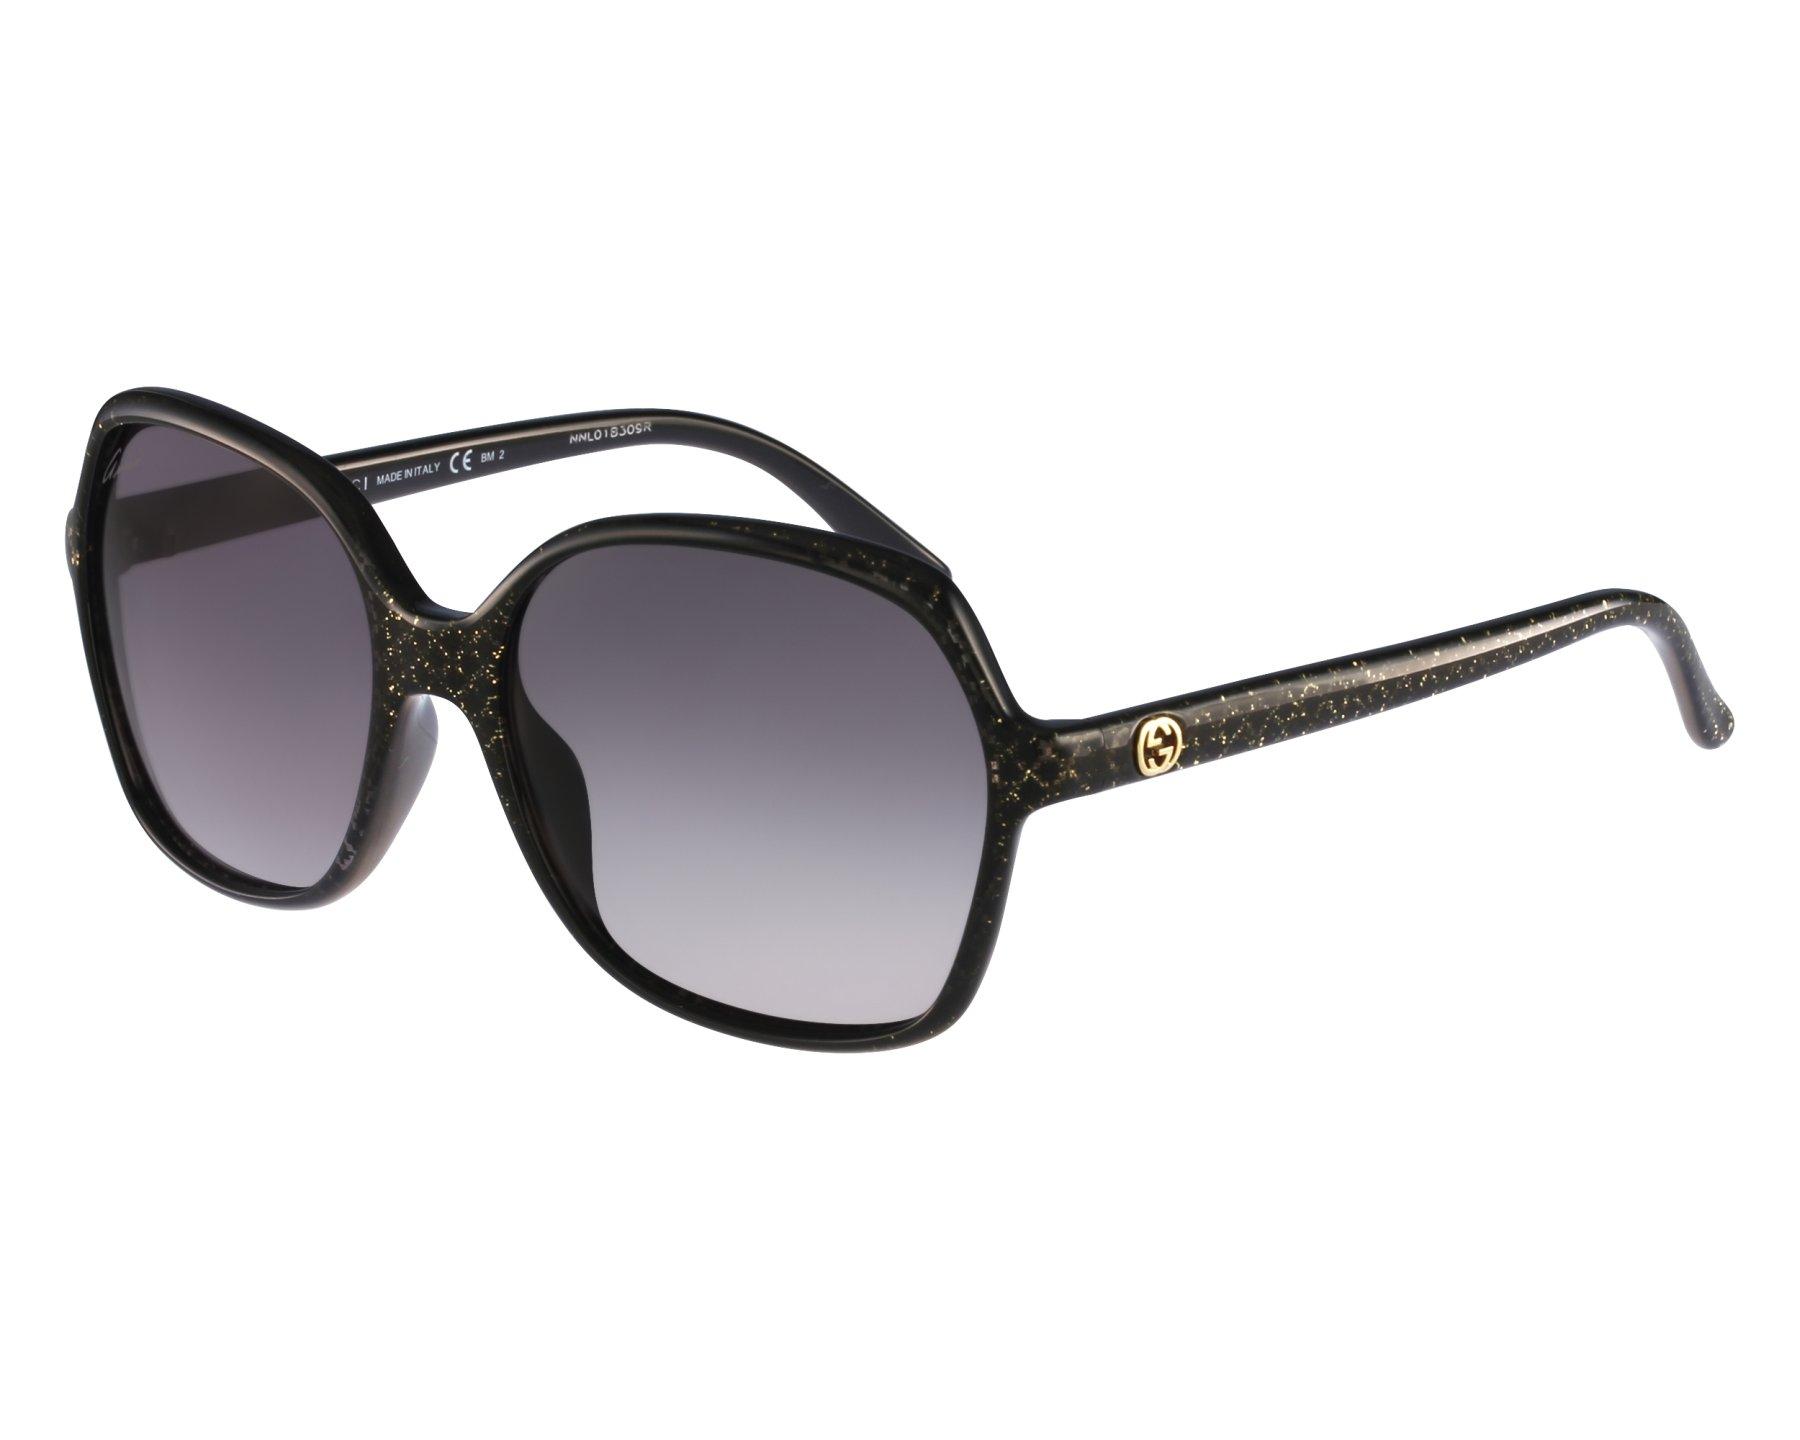 cfb923d15d7 thumbnail Sunglasses Gucci GG-3632-S DXF EU - Black front view